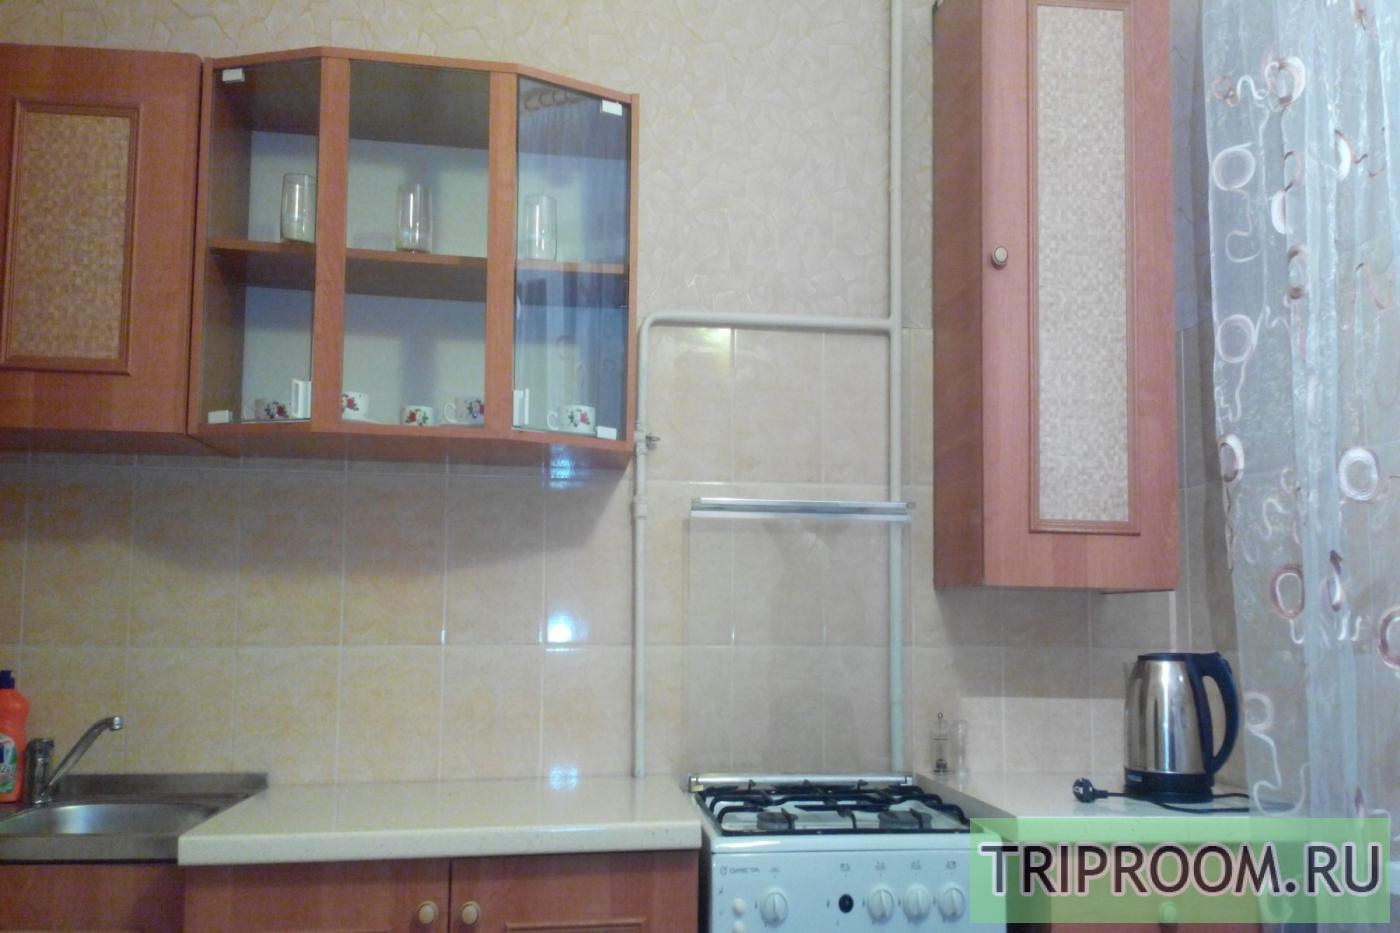 1-комнатная квартира посуточно (вариант № 30535), ул. Лермонтова улица, фото № 12